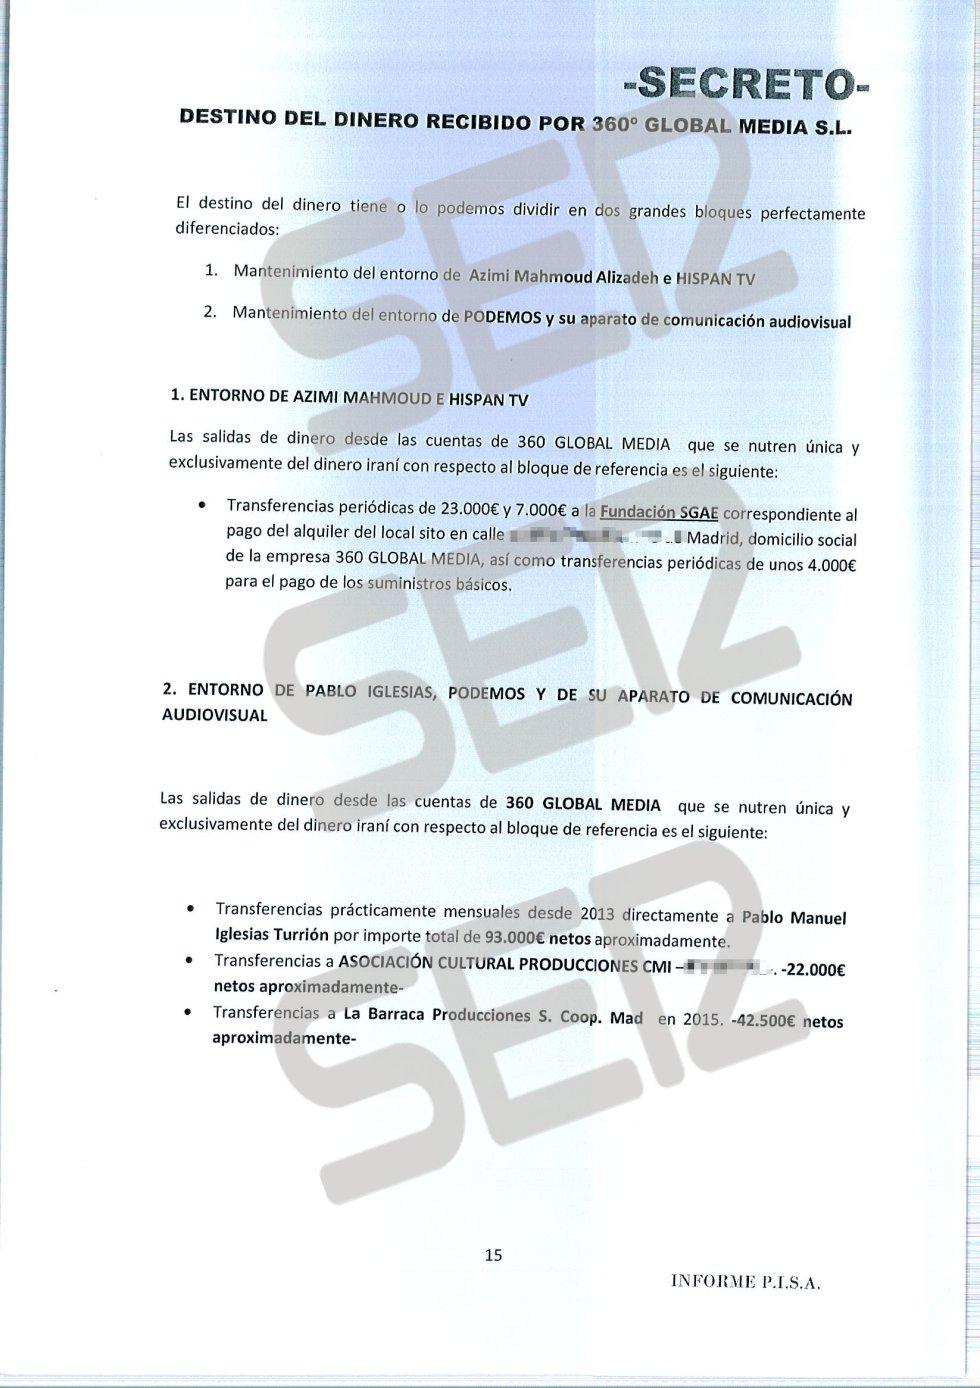 'Informe PISA' (Pablo Iglesias S.A.) de la UDEF